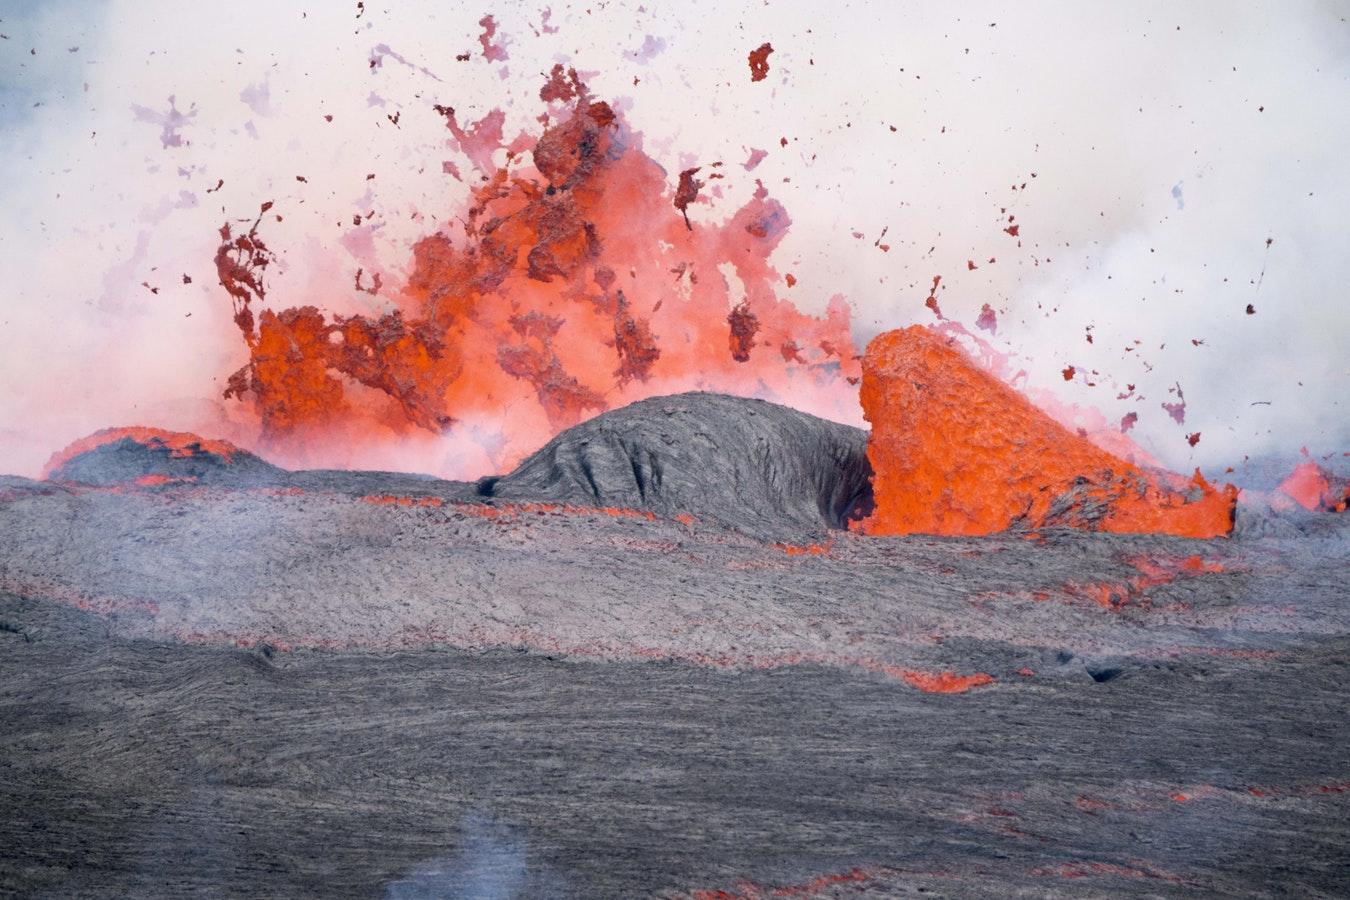 Saints safe from Guatemala volcano eruption